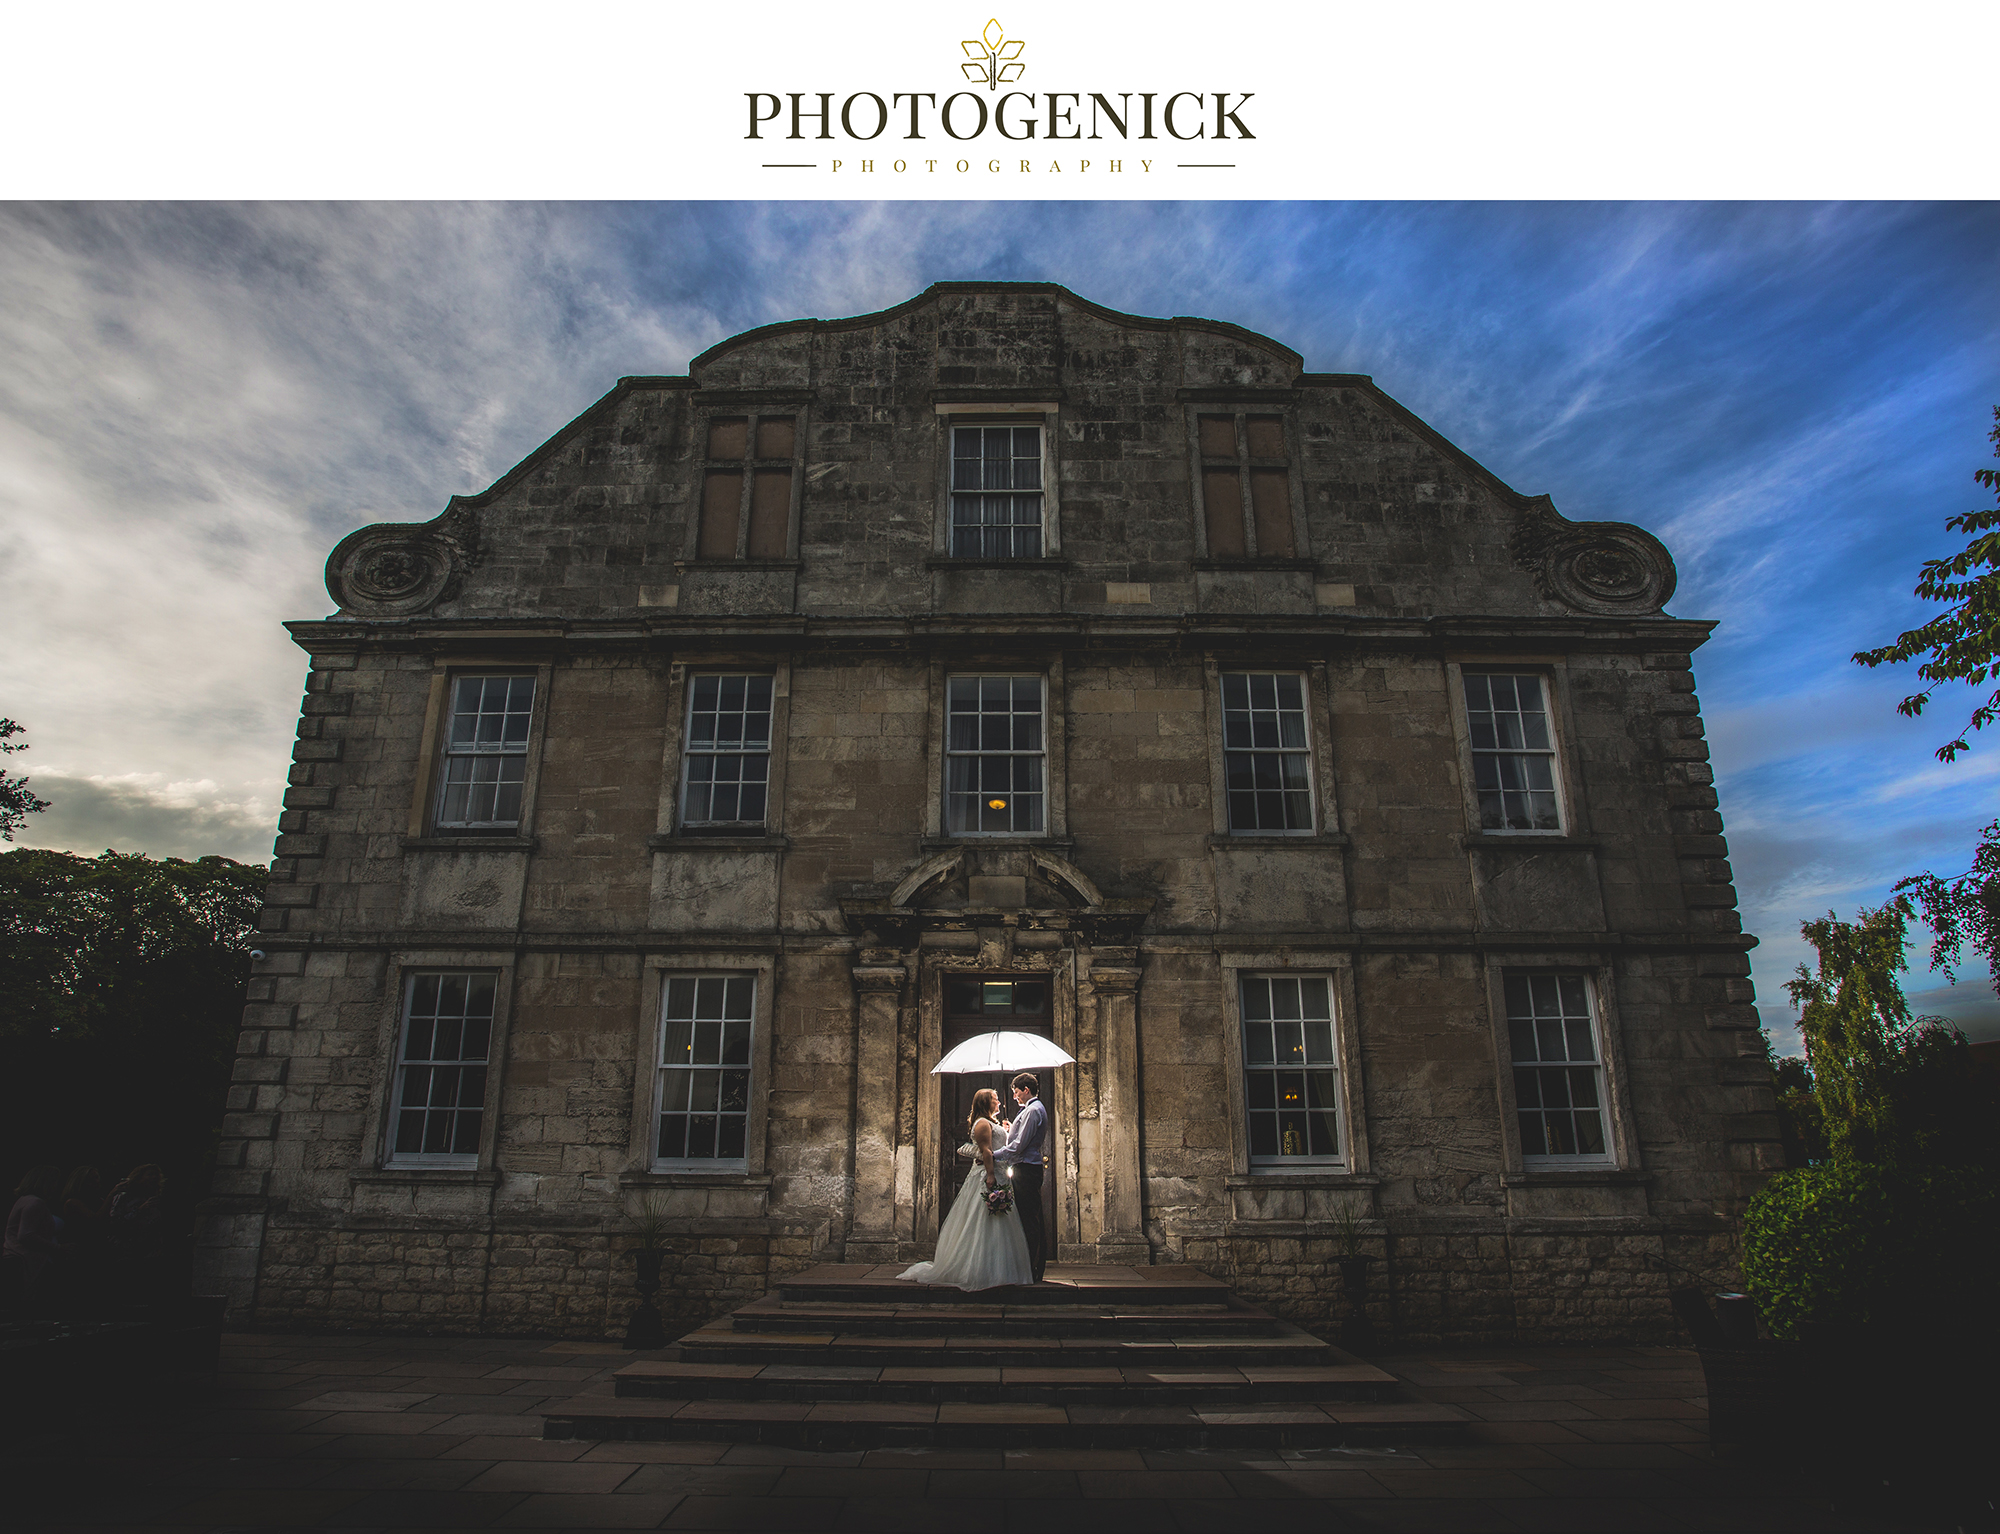 wedding photographer in rotherham